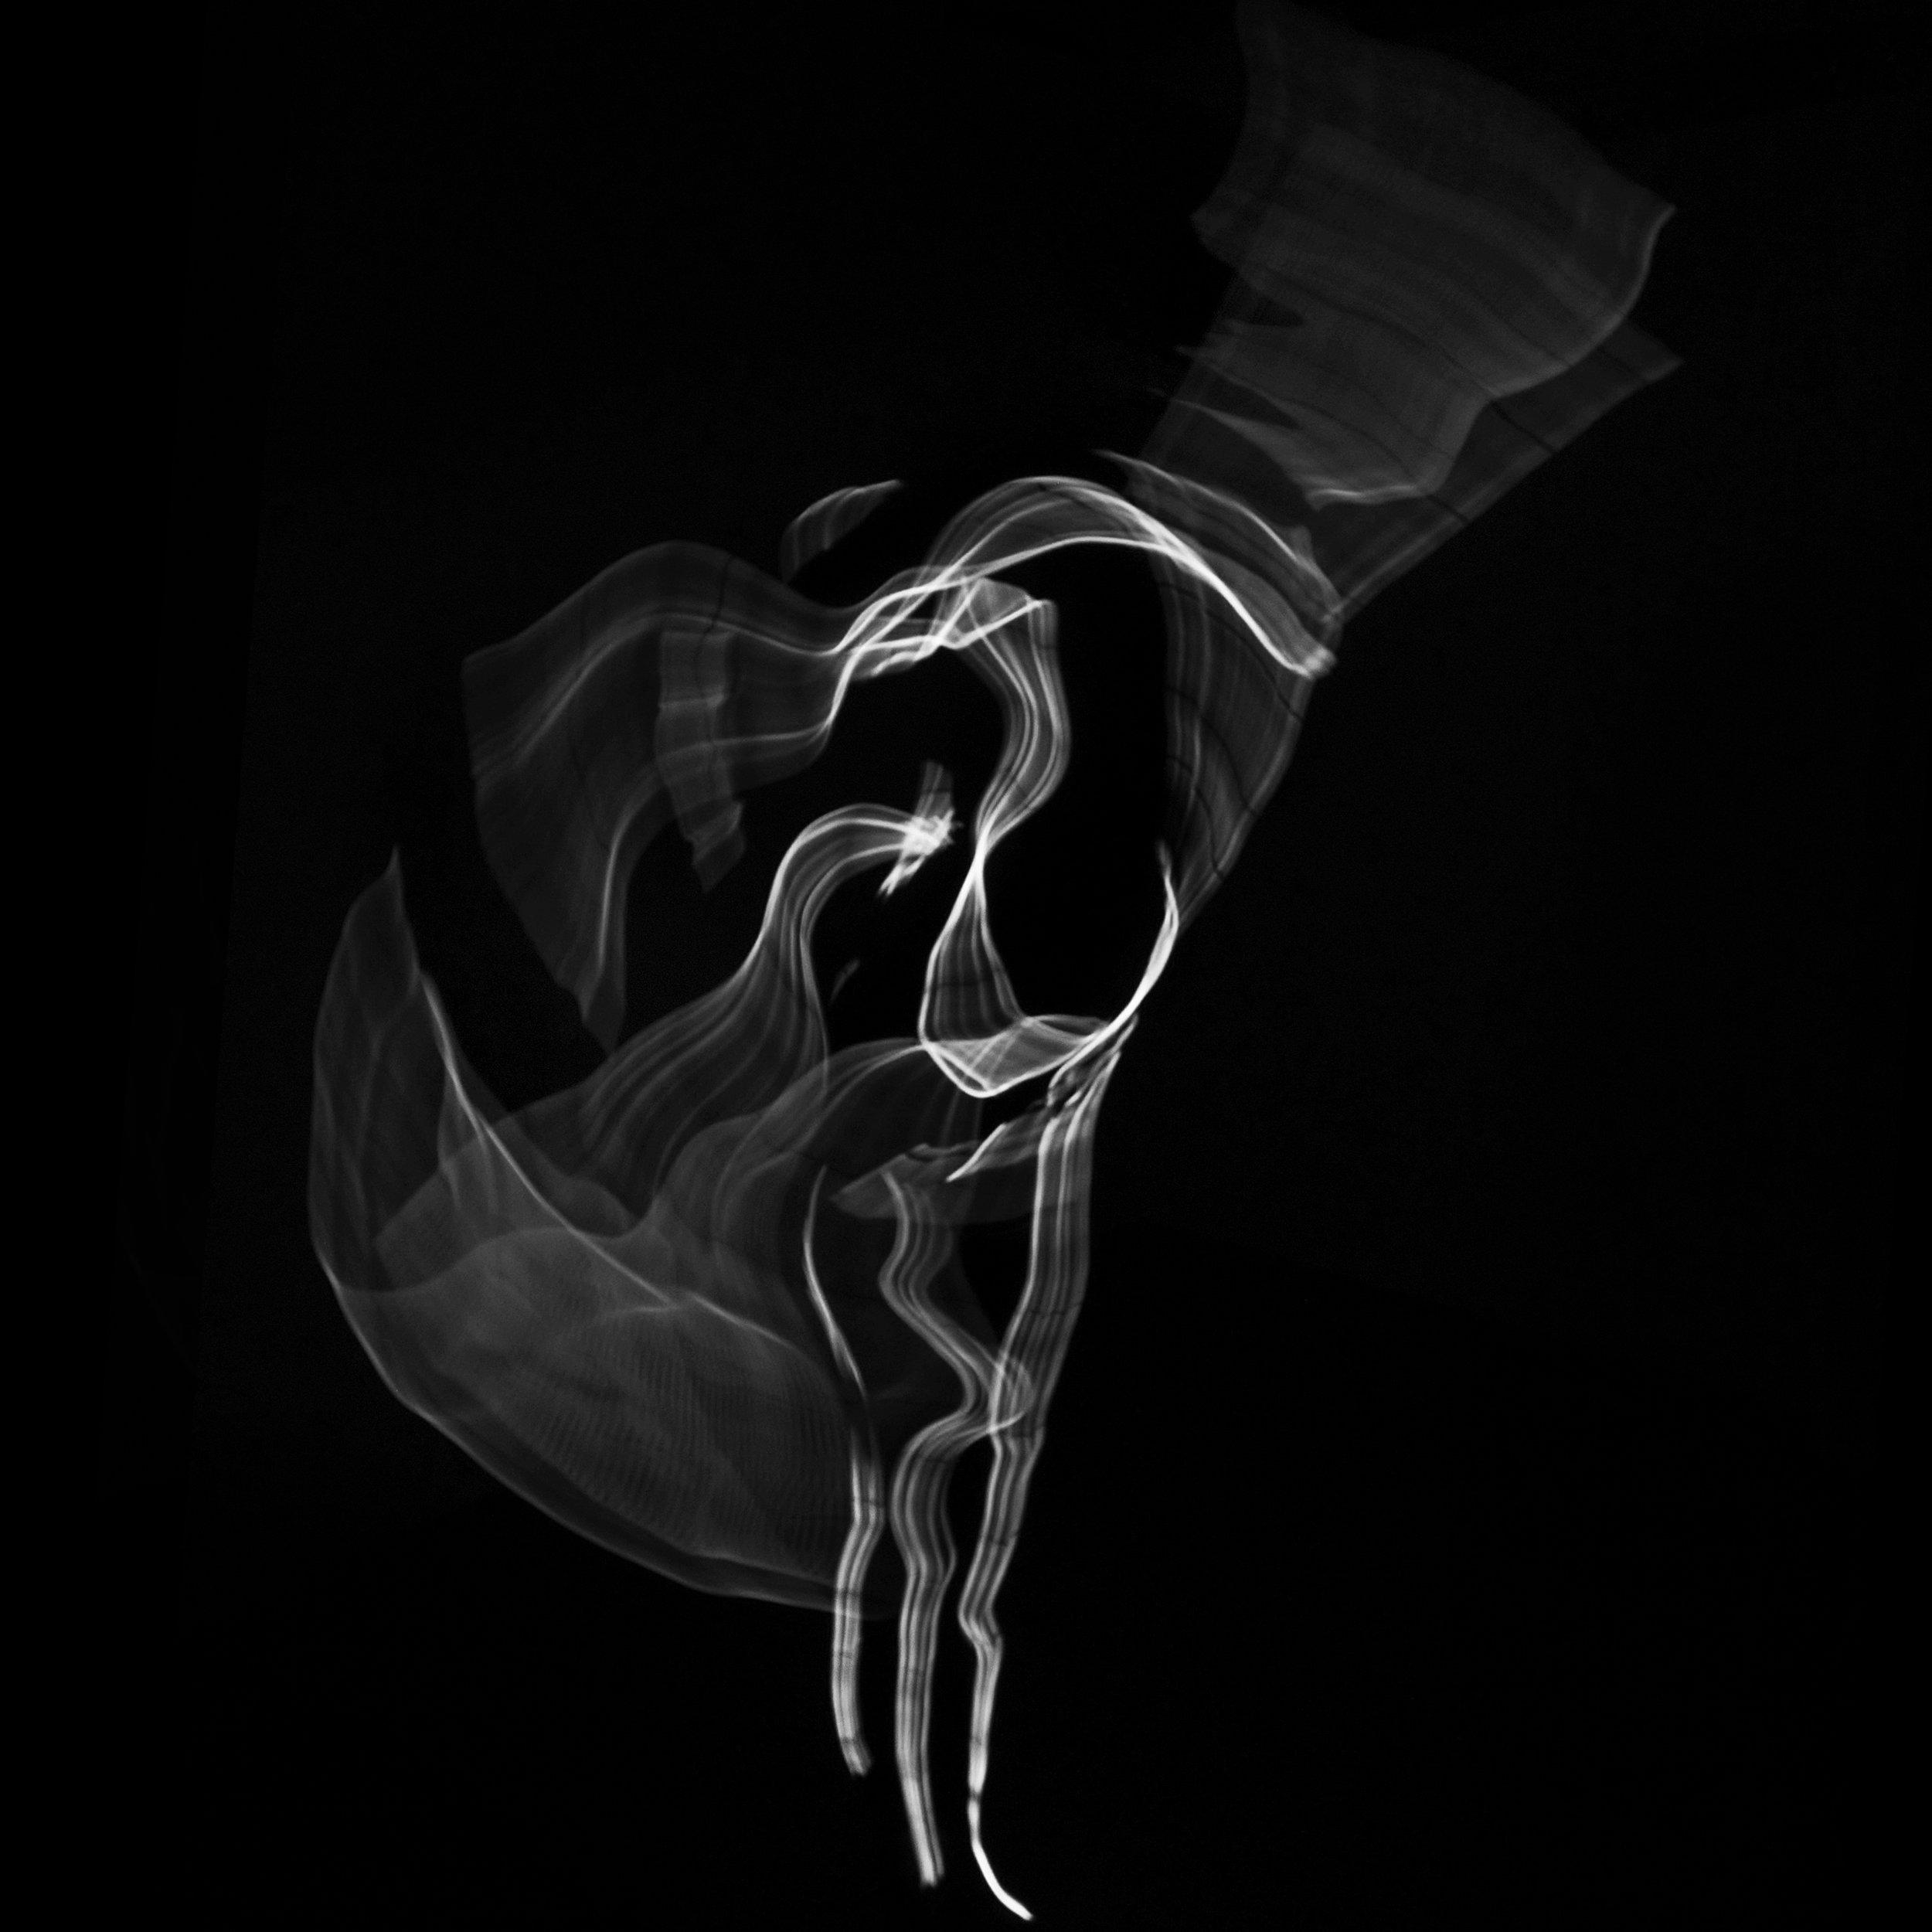 DANCER POSE 1